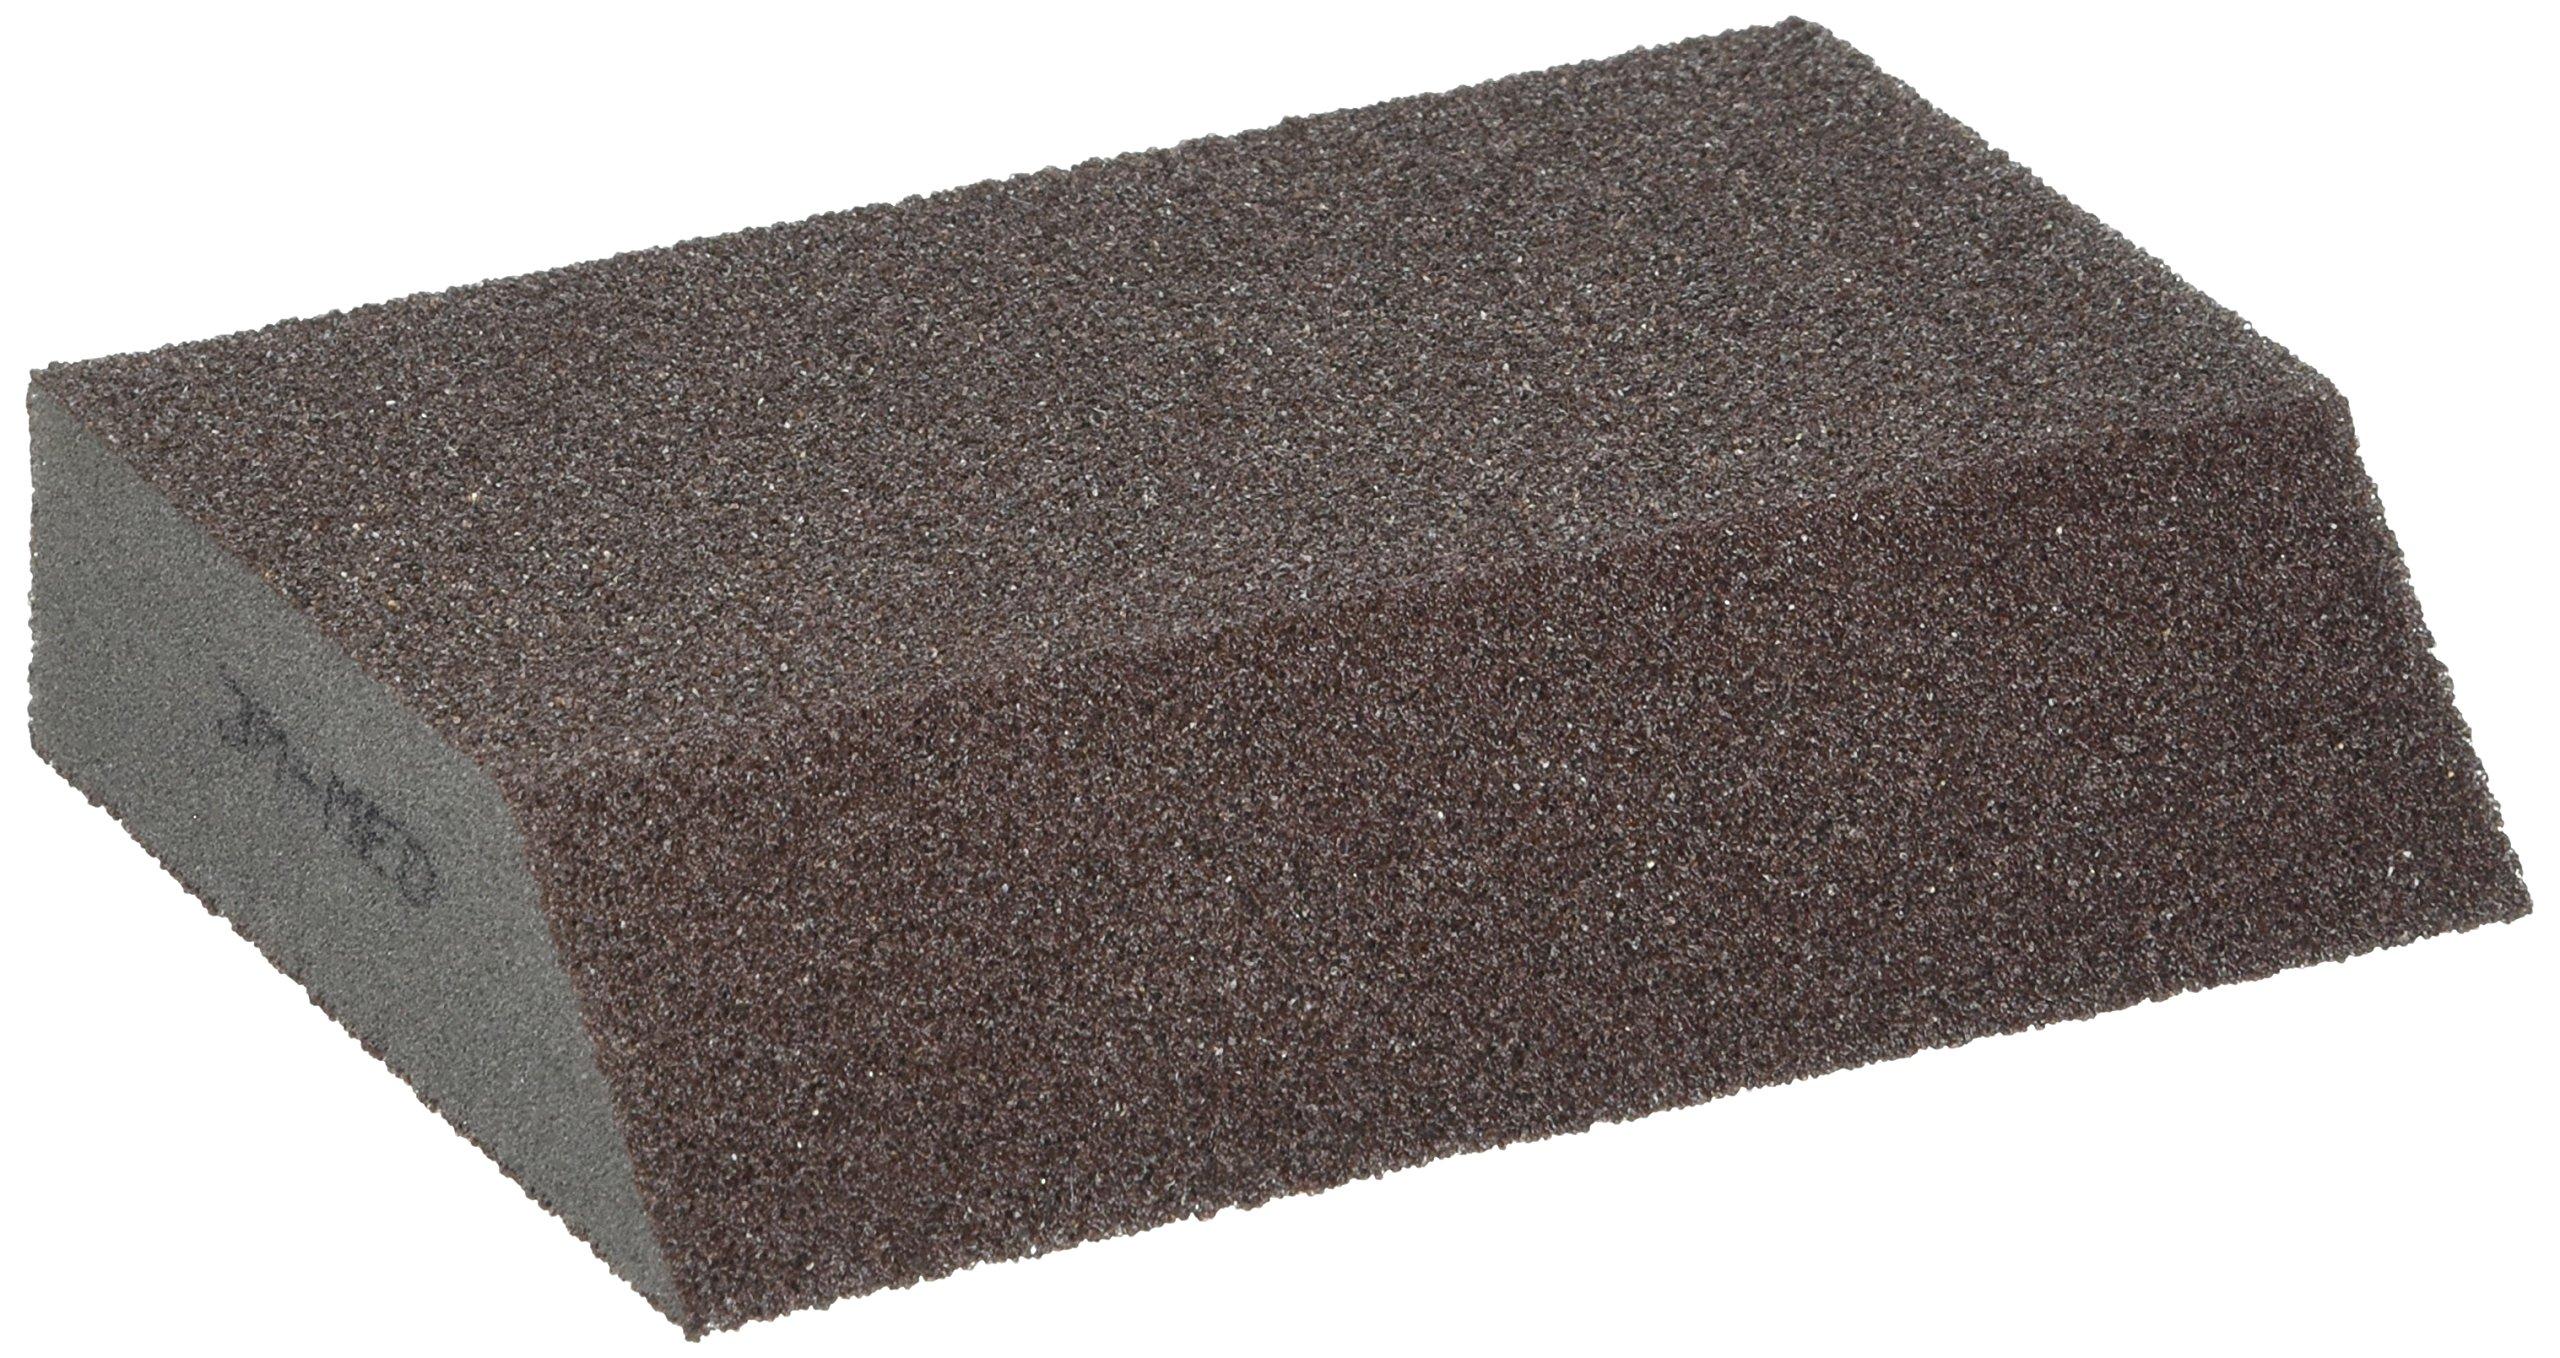 3M Sanding Sponge, Medium Grit, 2.875-Inch by 4.875-Inch by 1-Inch, 6-Sponge